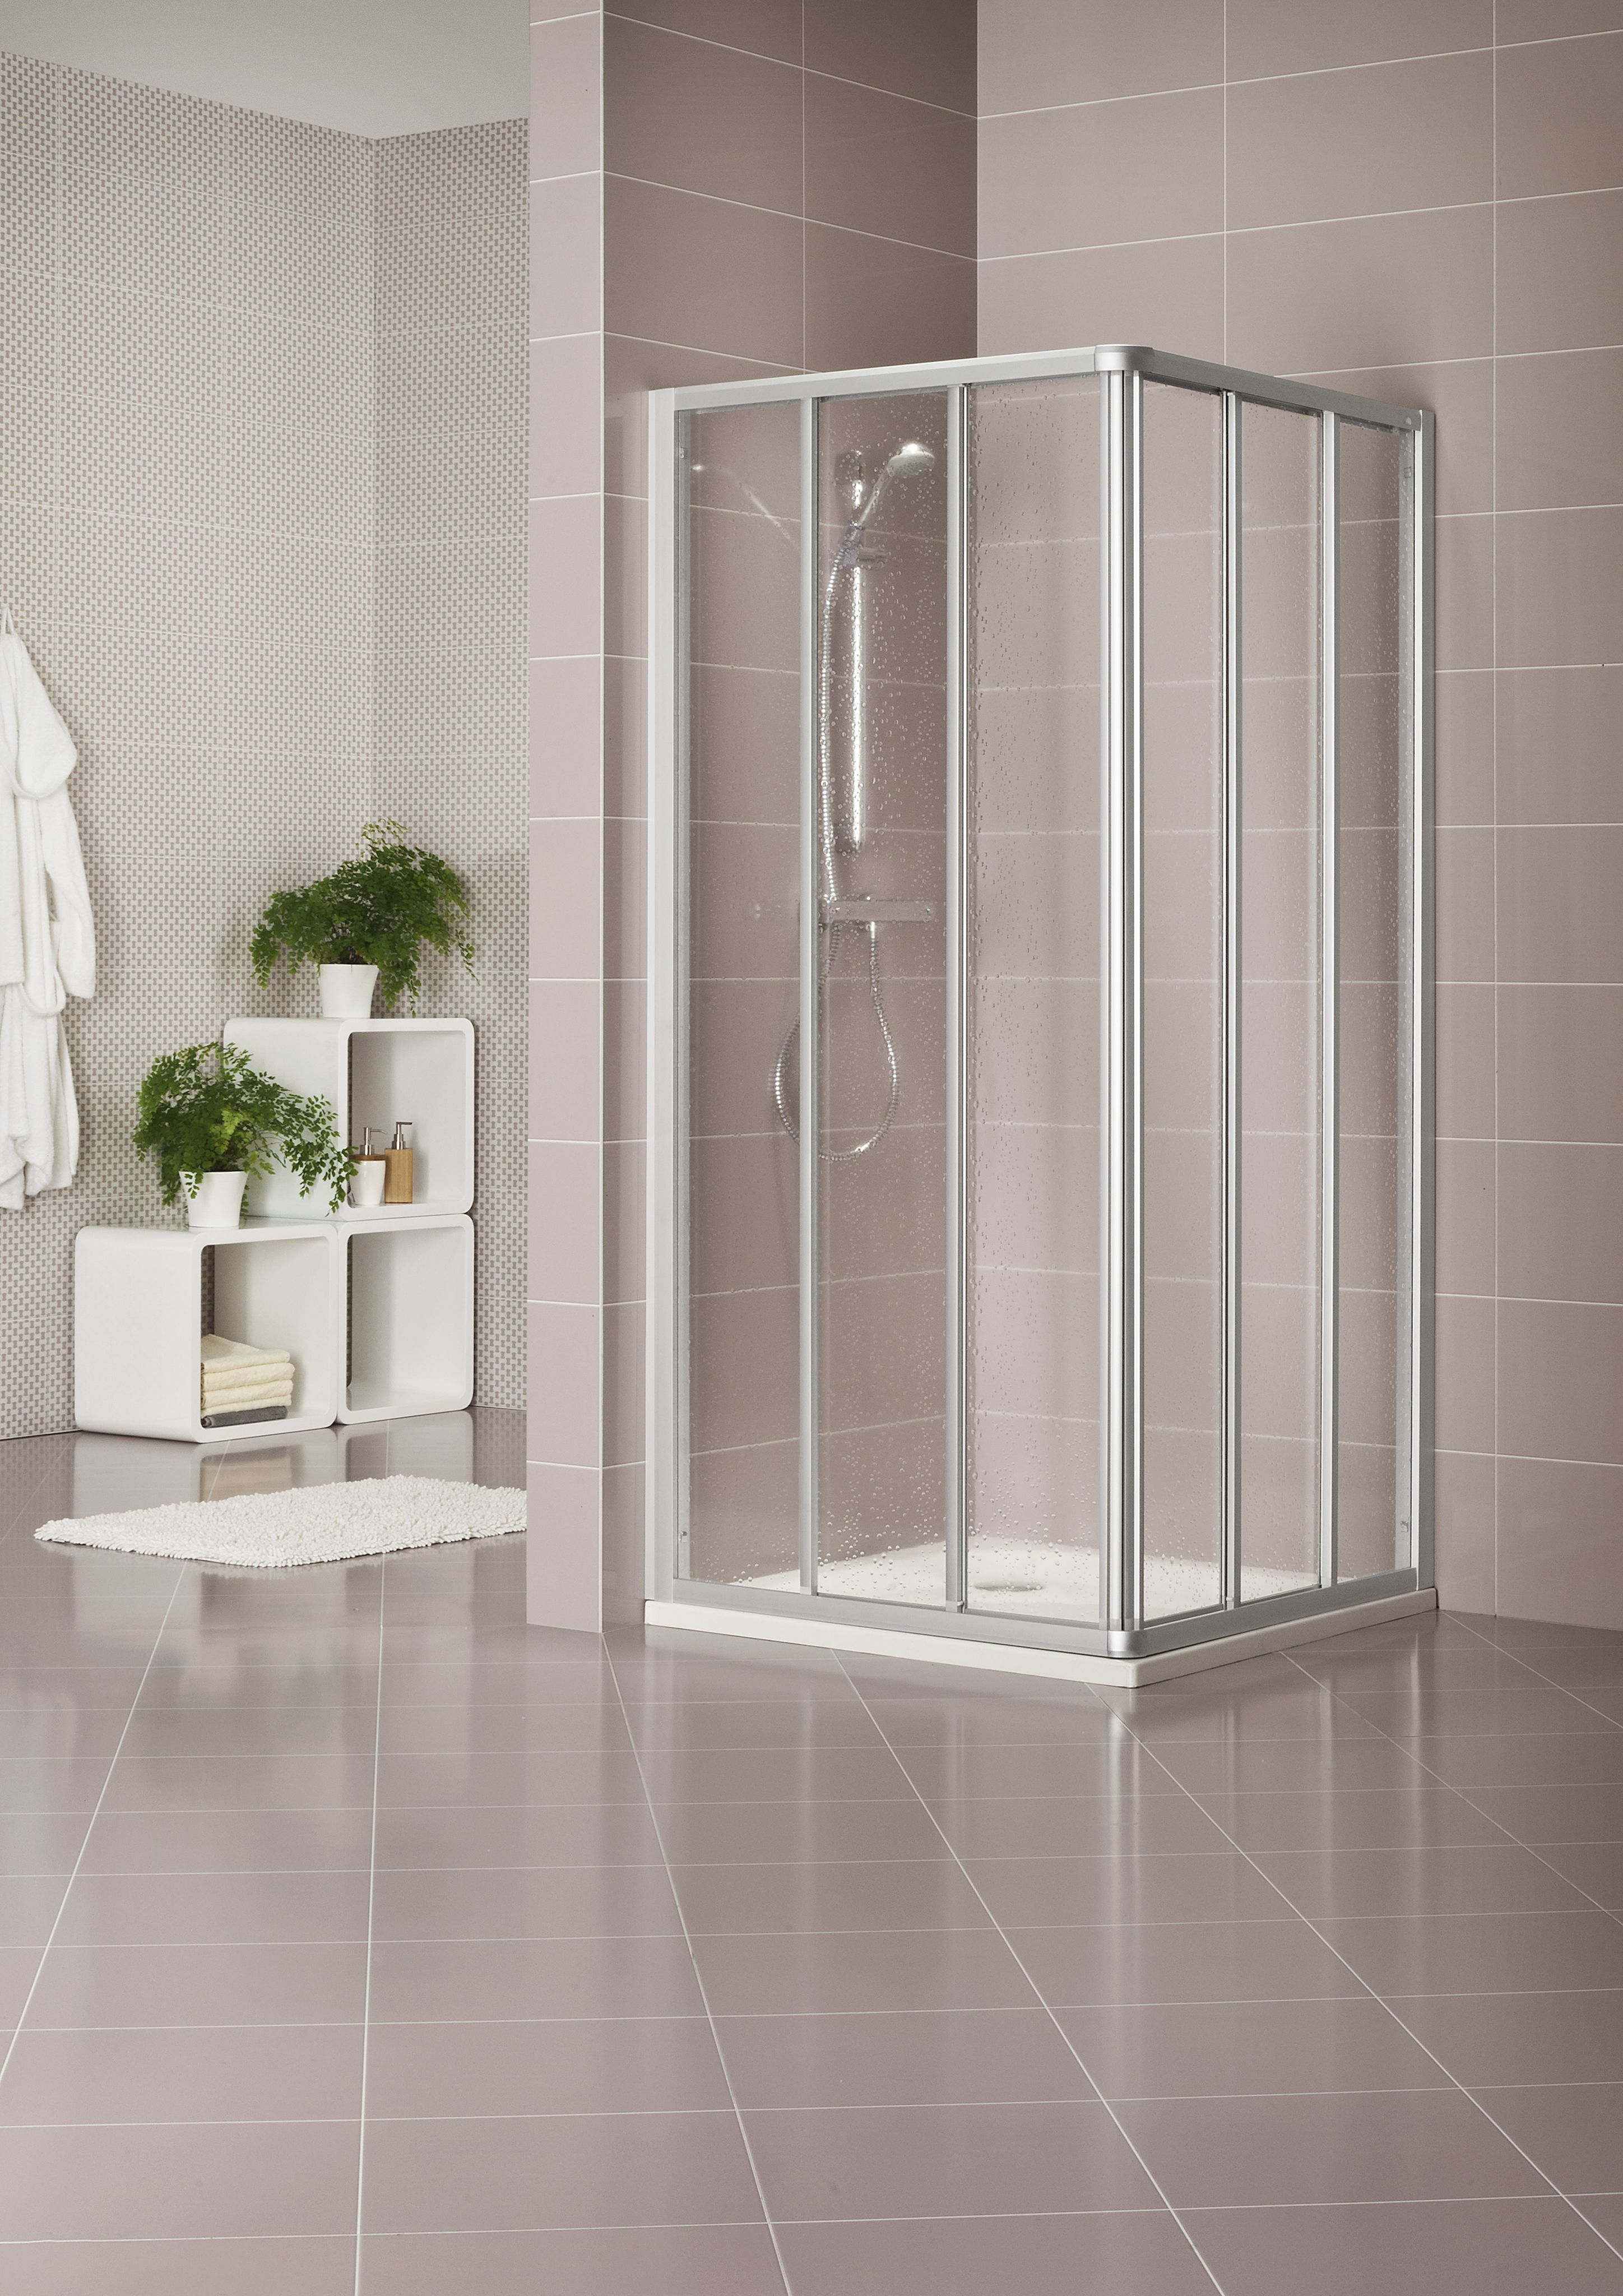 Dukessa 3000 In 2020 Corner Shower Enclosures Shower Enclosure Safety Glass